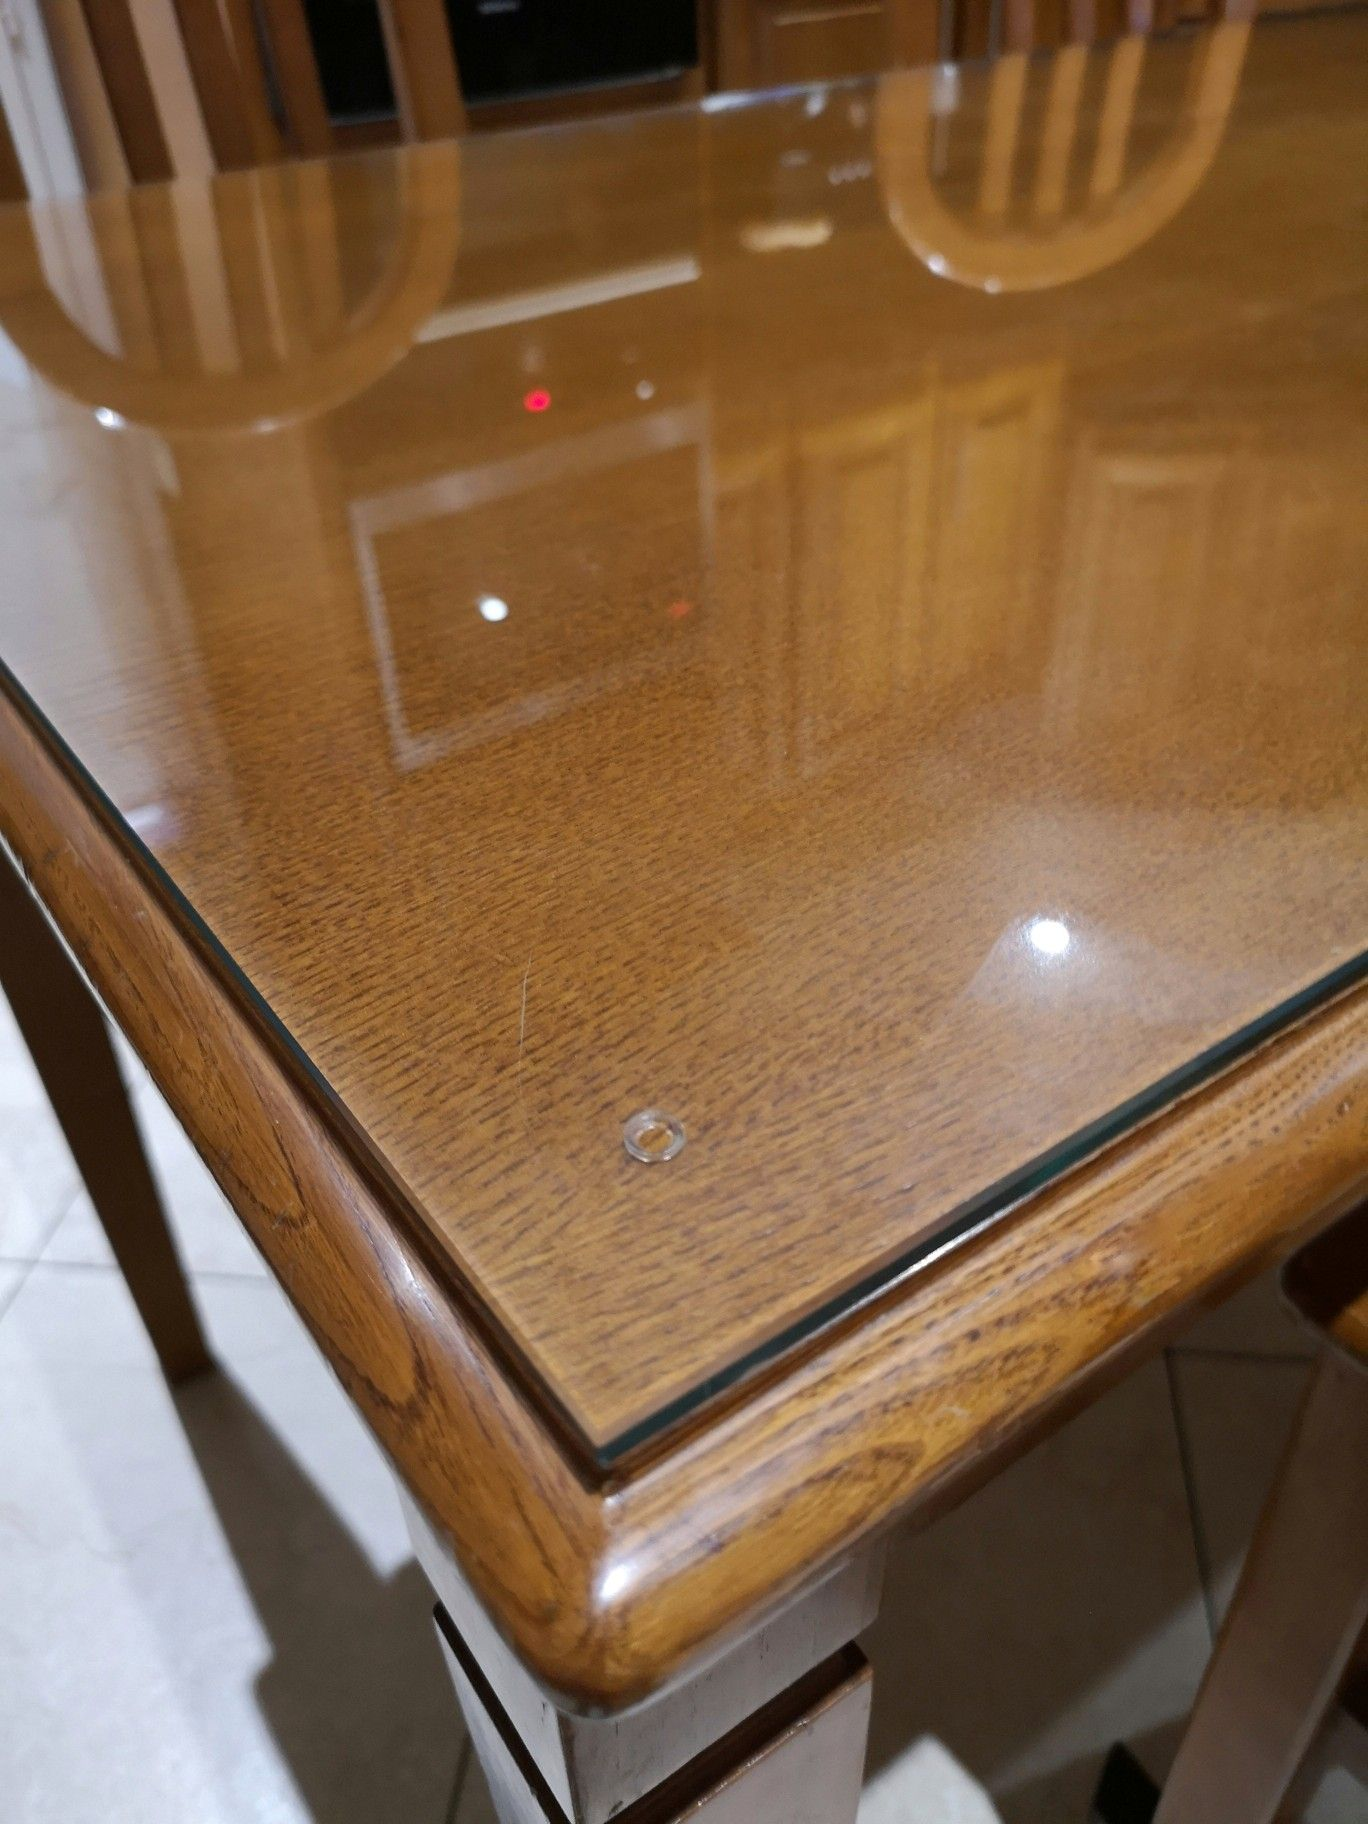 Protection De Table En Verre Trempe Meubles En Verre Paroi De Douche Table En Verre